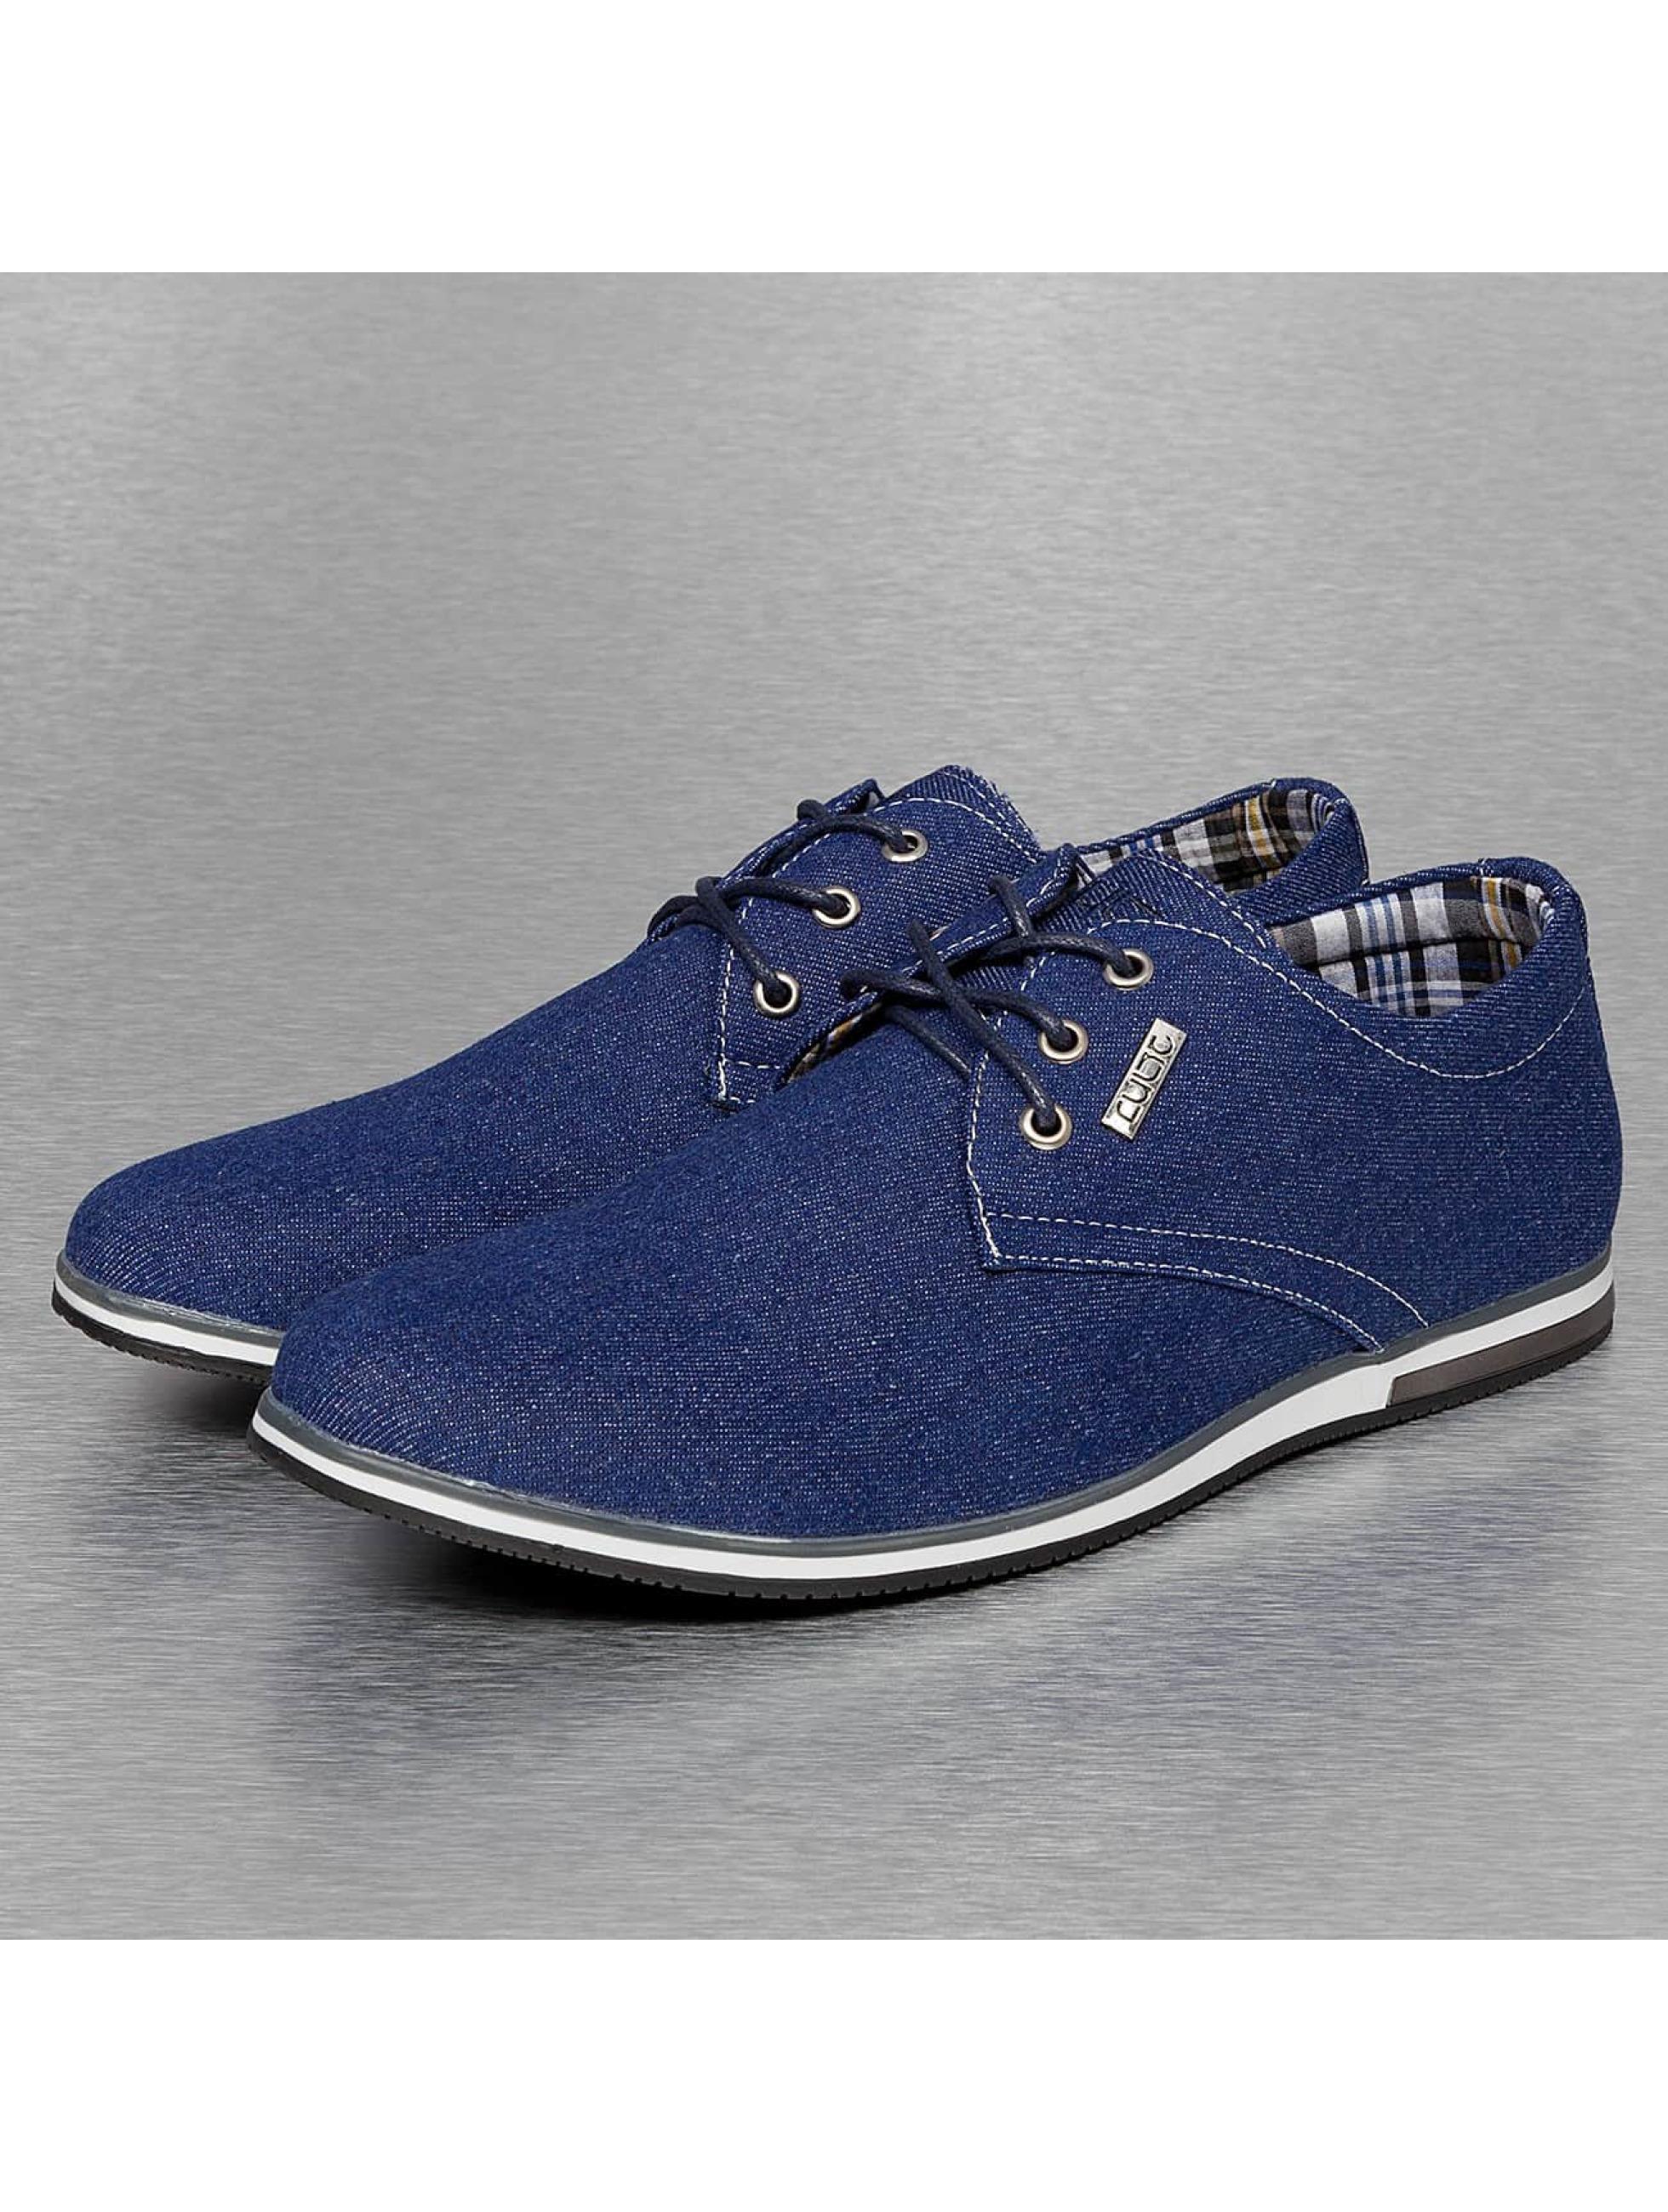 New York Style Сникеры Galway Denim синий